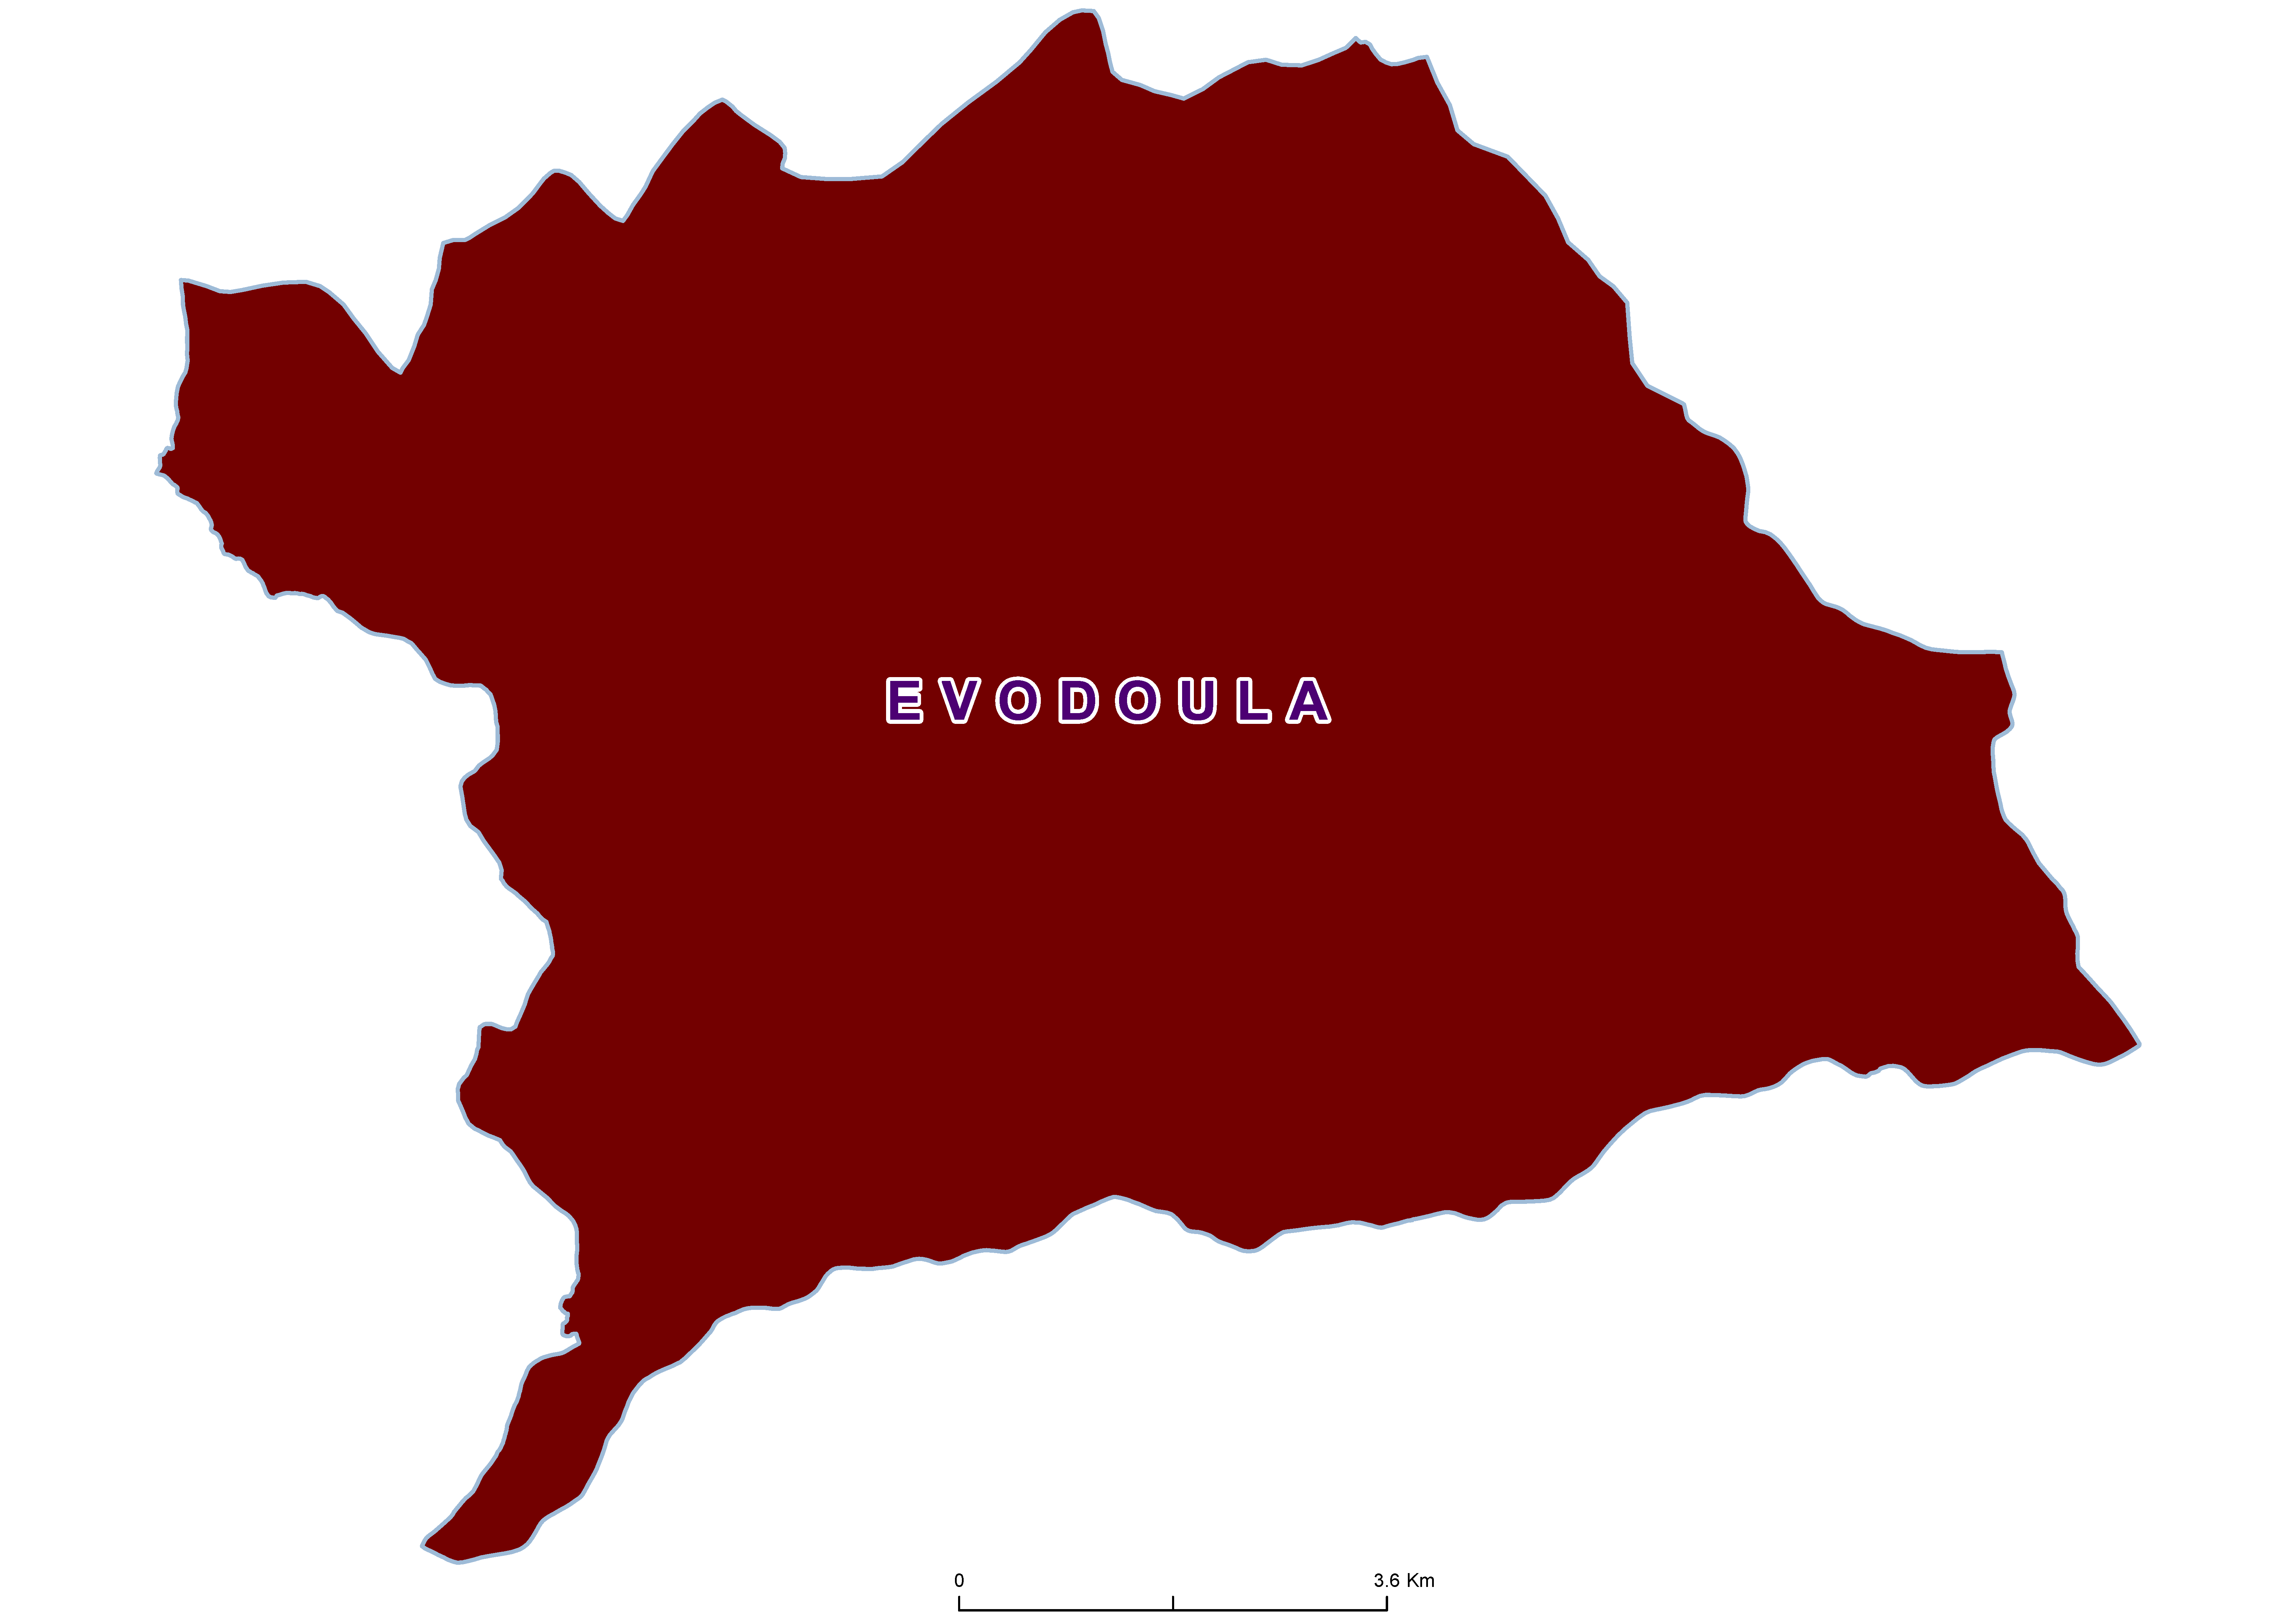 Evodoula Mean STH 19850001